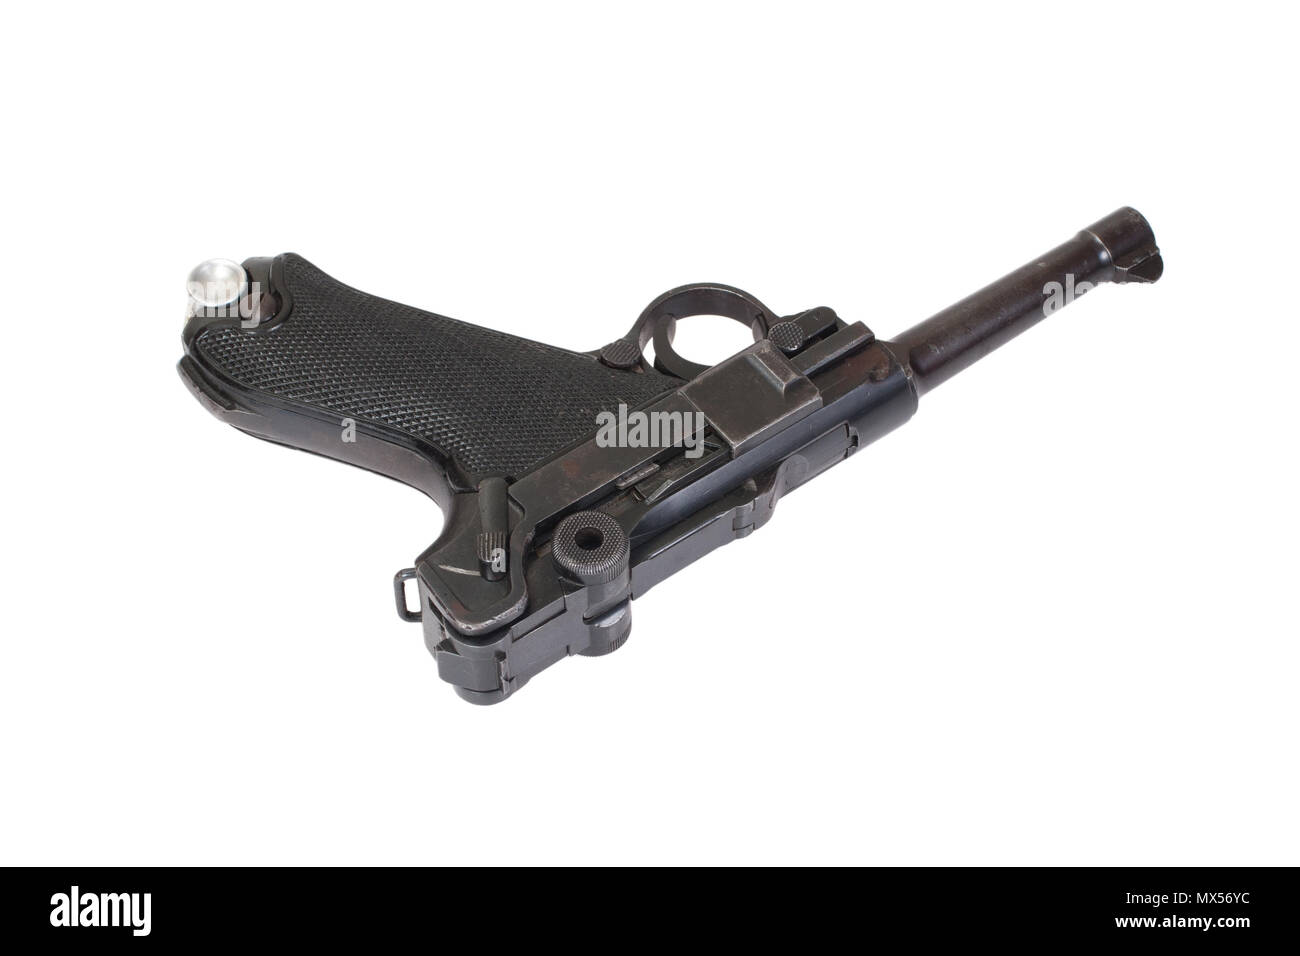 Luger - Parabellum handgun isolated - Stock Image